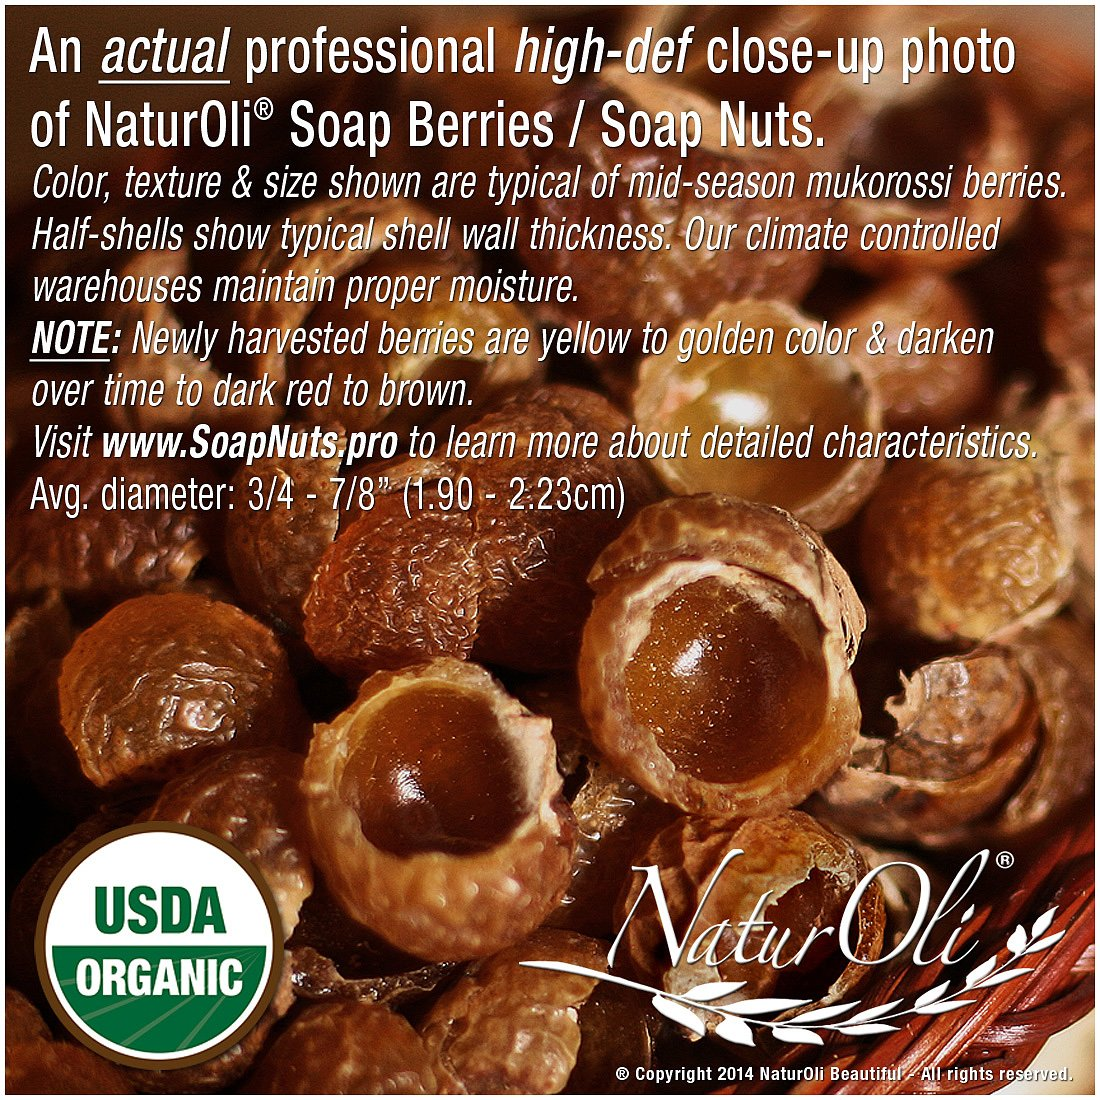 OVERSTOCK SALE!! NaturOli Organic Soap Nuts/Soap Berries PIECES/BULK - FIVE POUNDS (1000+ Loads) Seedless USDA Certified - Fresh Wild Harvest - Hypoallergenic, Non-toxic by NaturOli (Image #2)